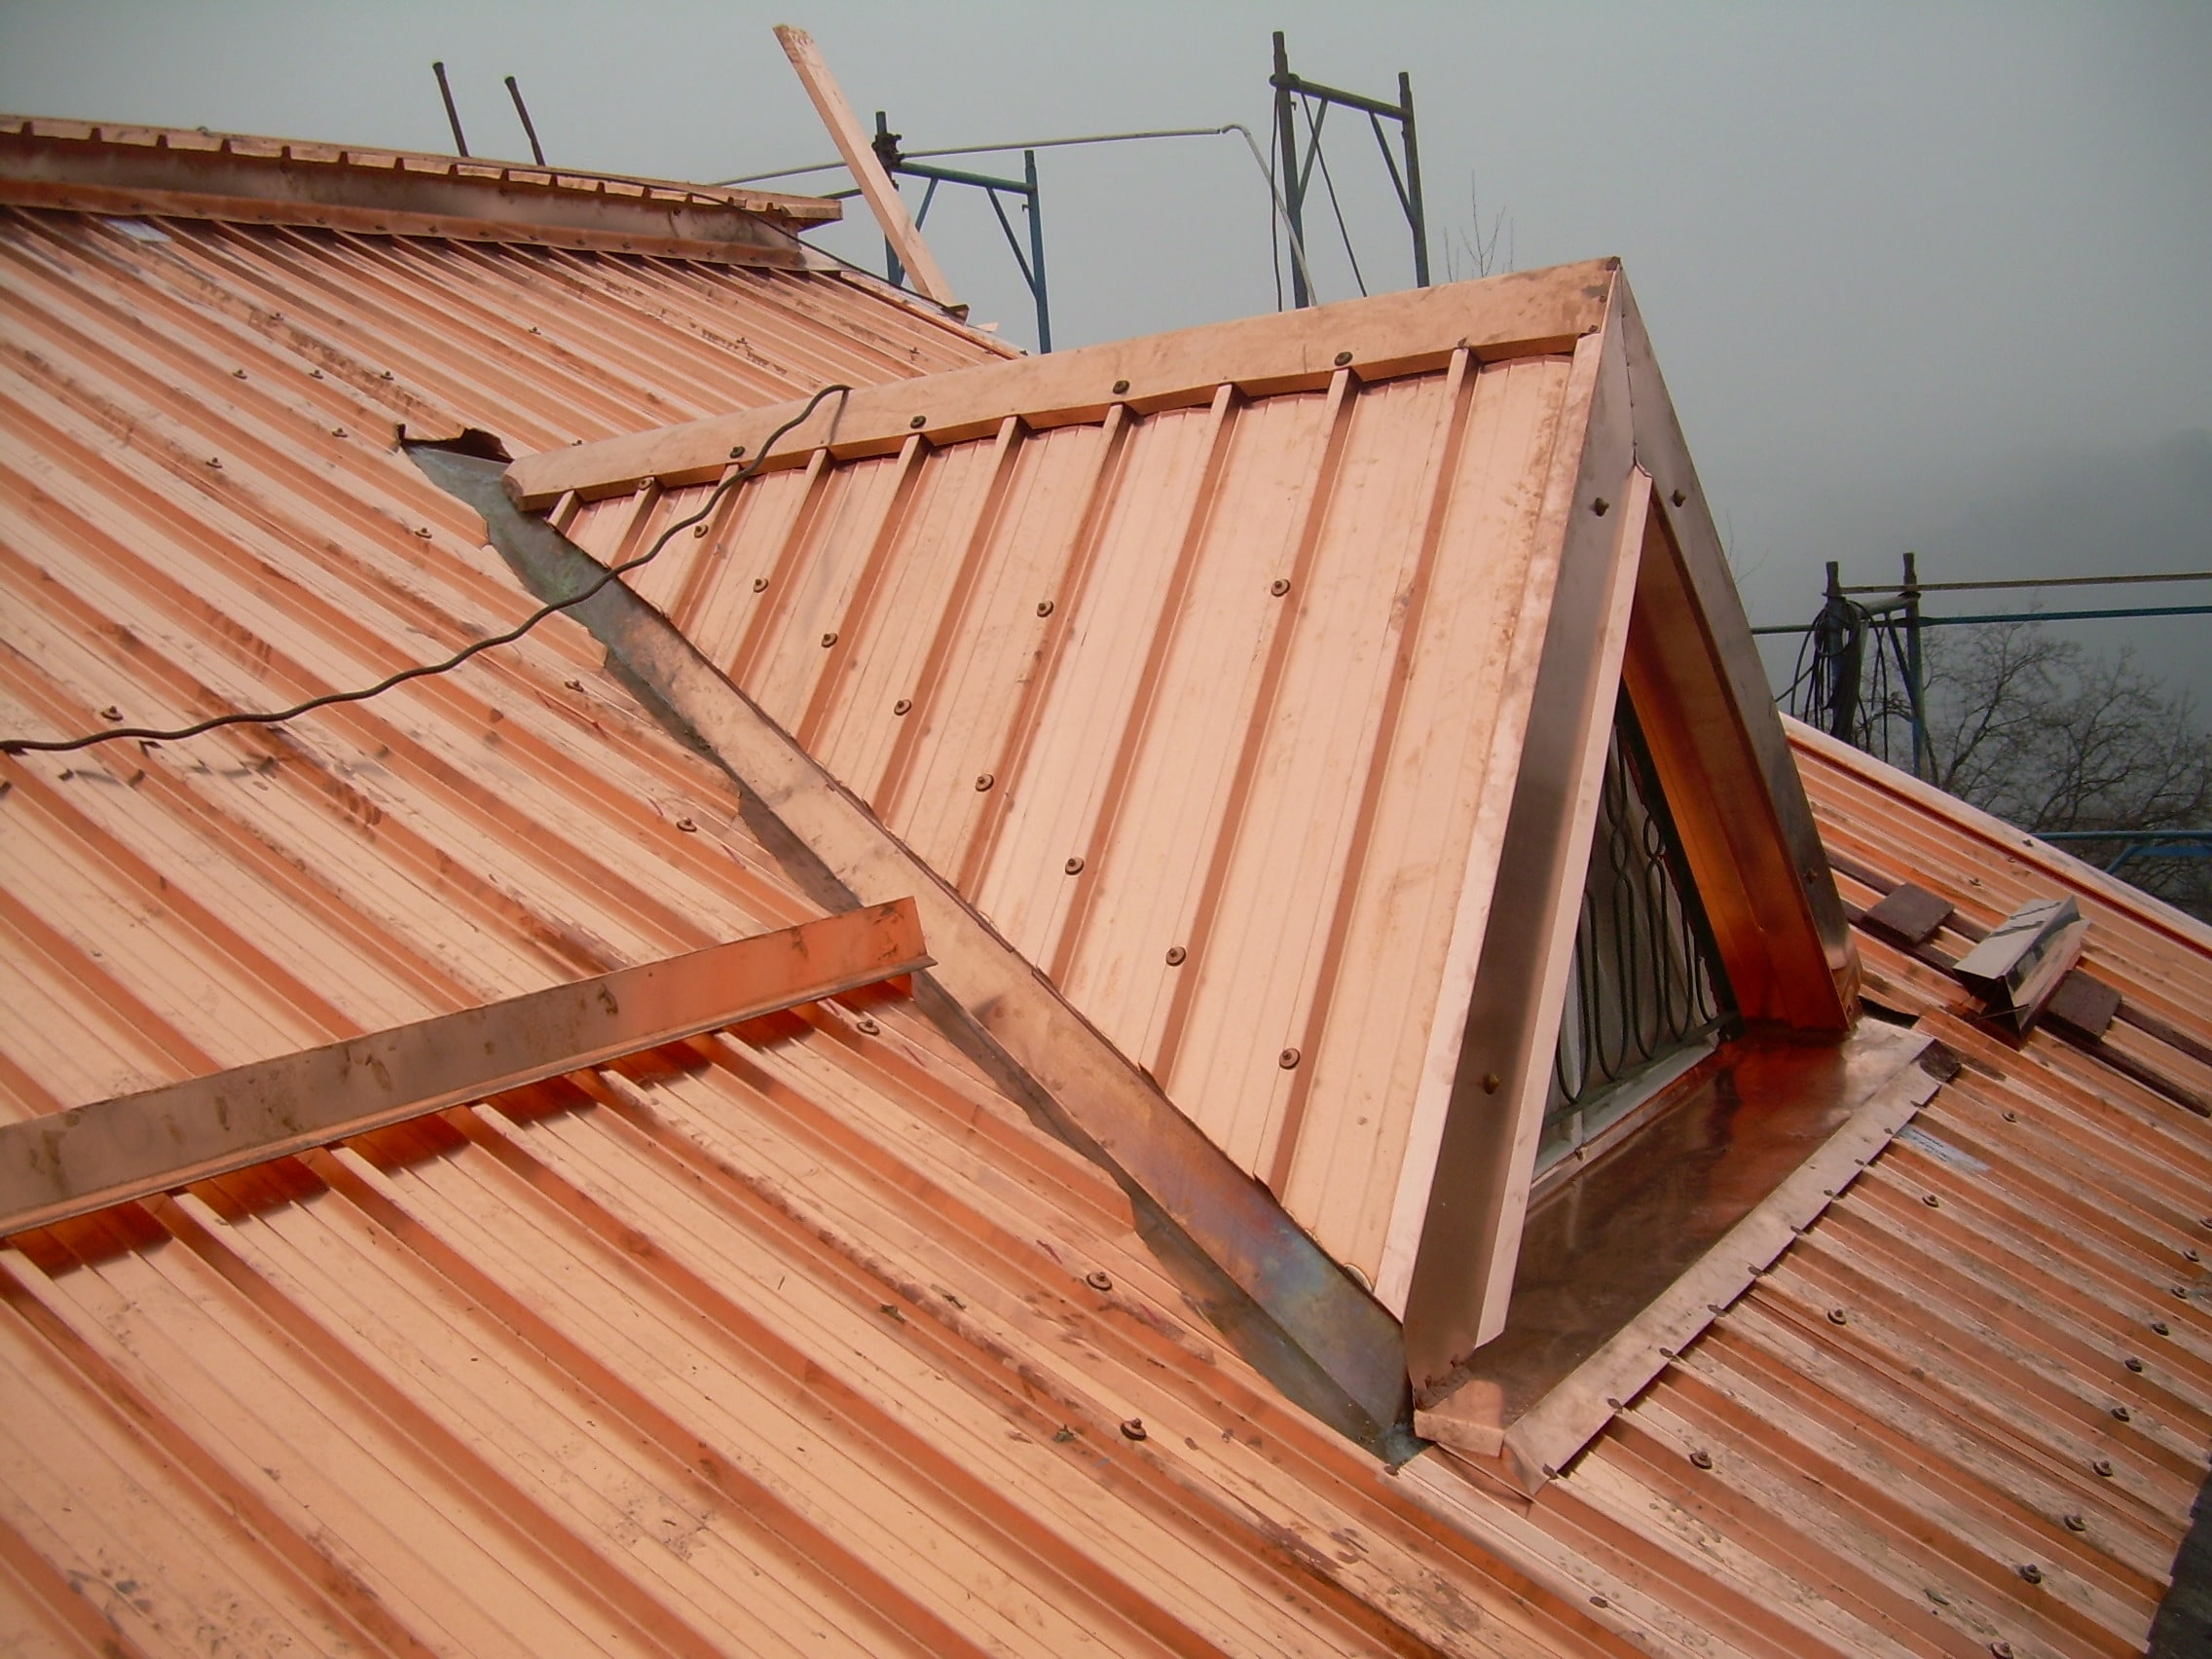 Smaltimento amianto Piemonte